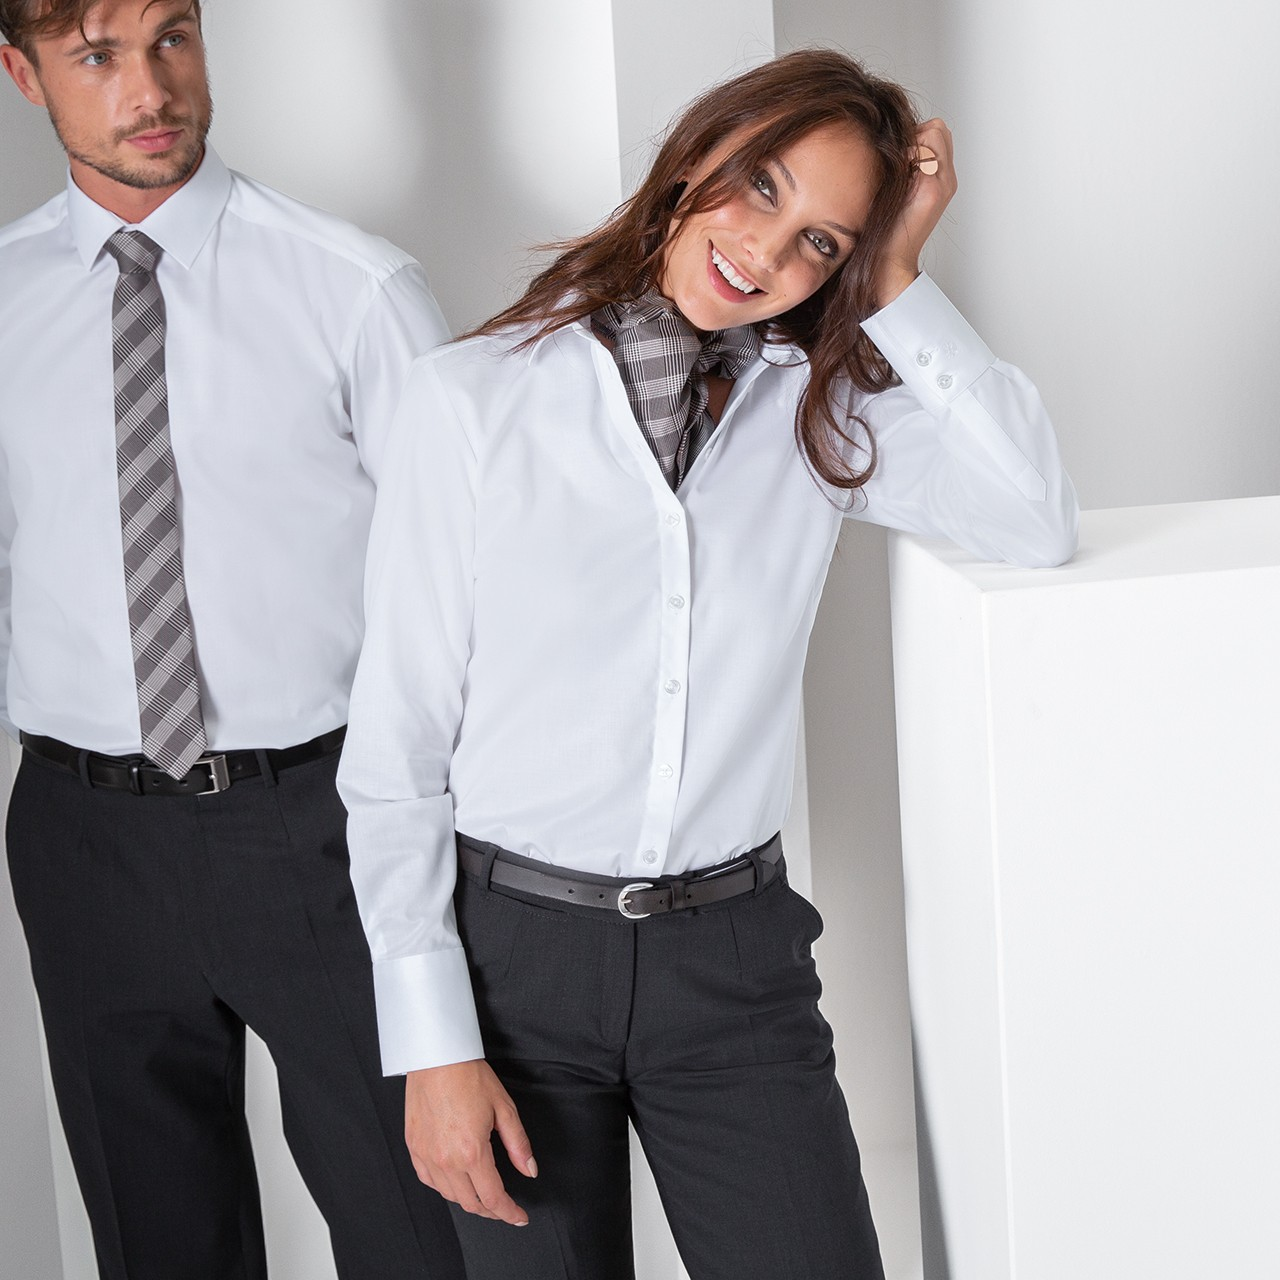 Premium Damen Langarm Bluse Weiss Comfort Fit Greiff® | bedrucken, besticken, bedrucken lassen, besticken lassen, mit Logo |